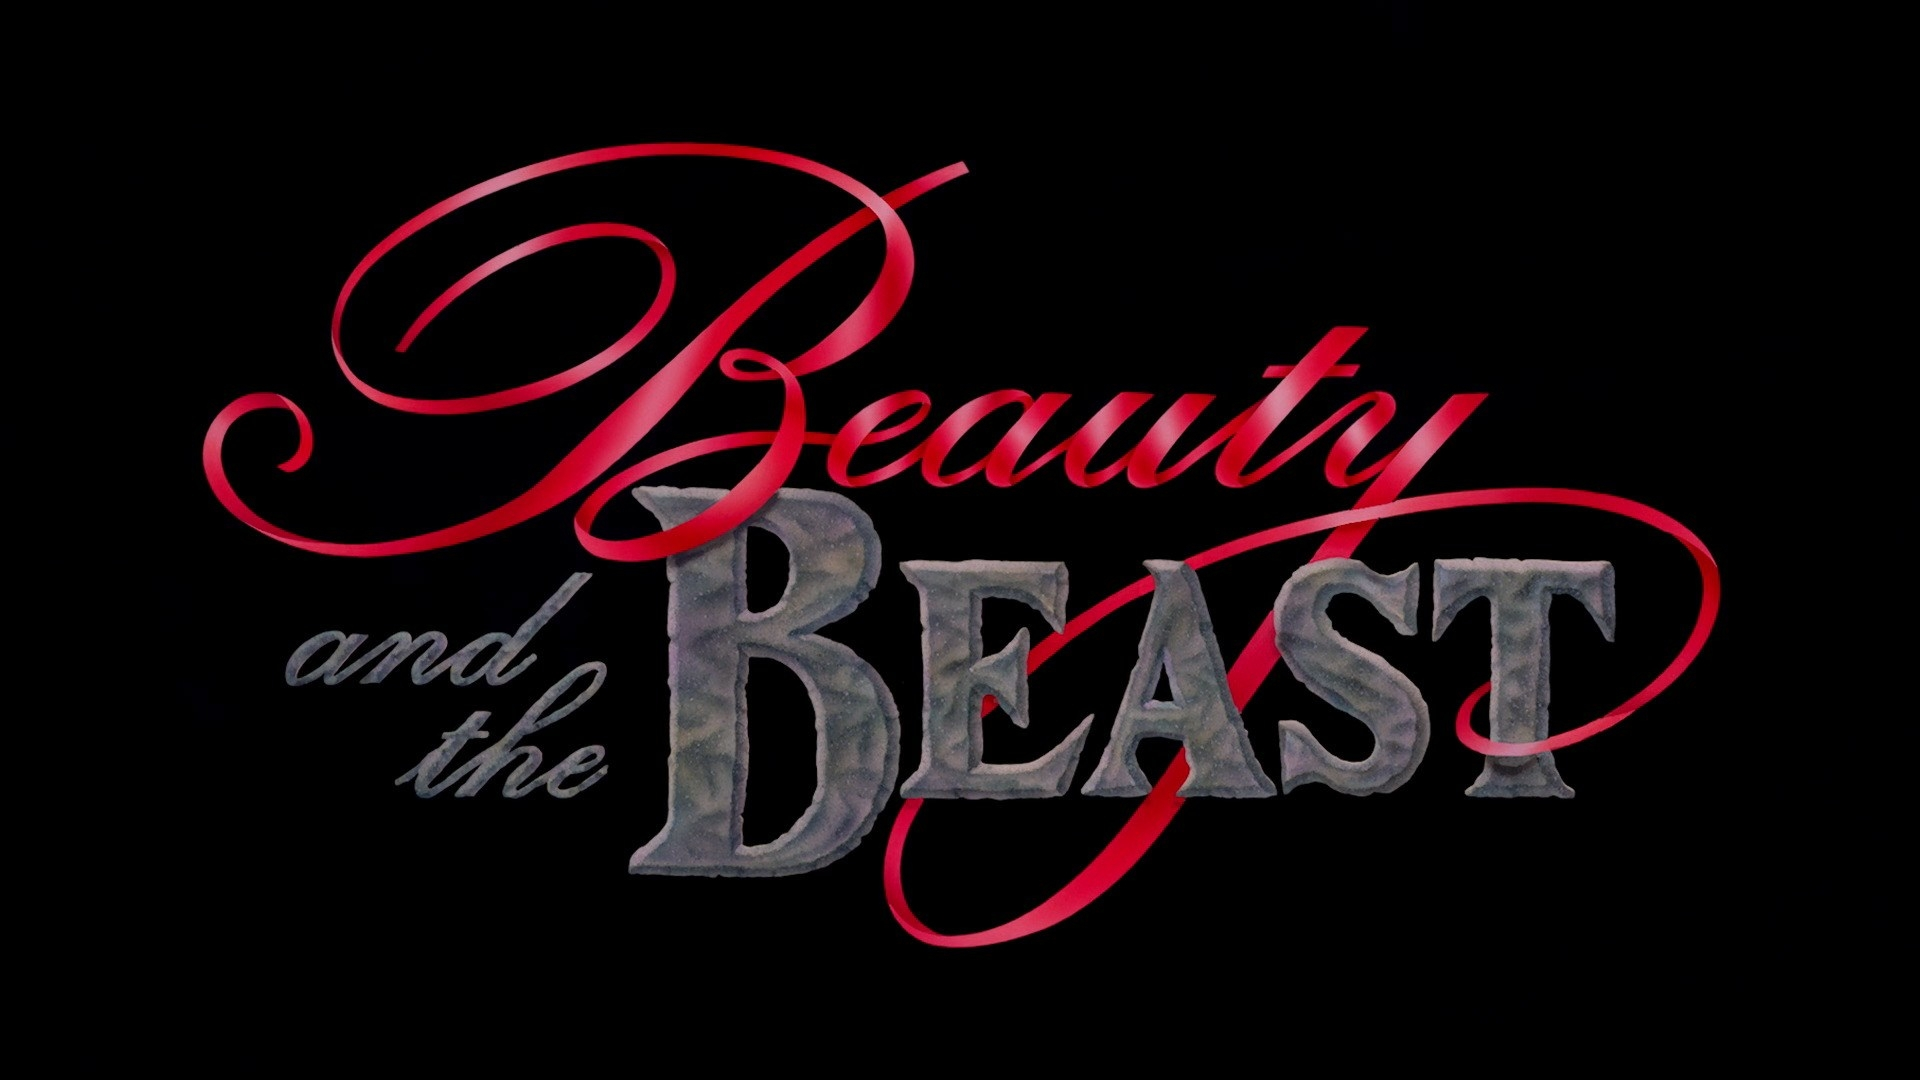 Skönheten och Odjuret (1991 Filmen) (@annebeats) Cover Image